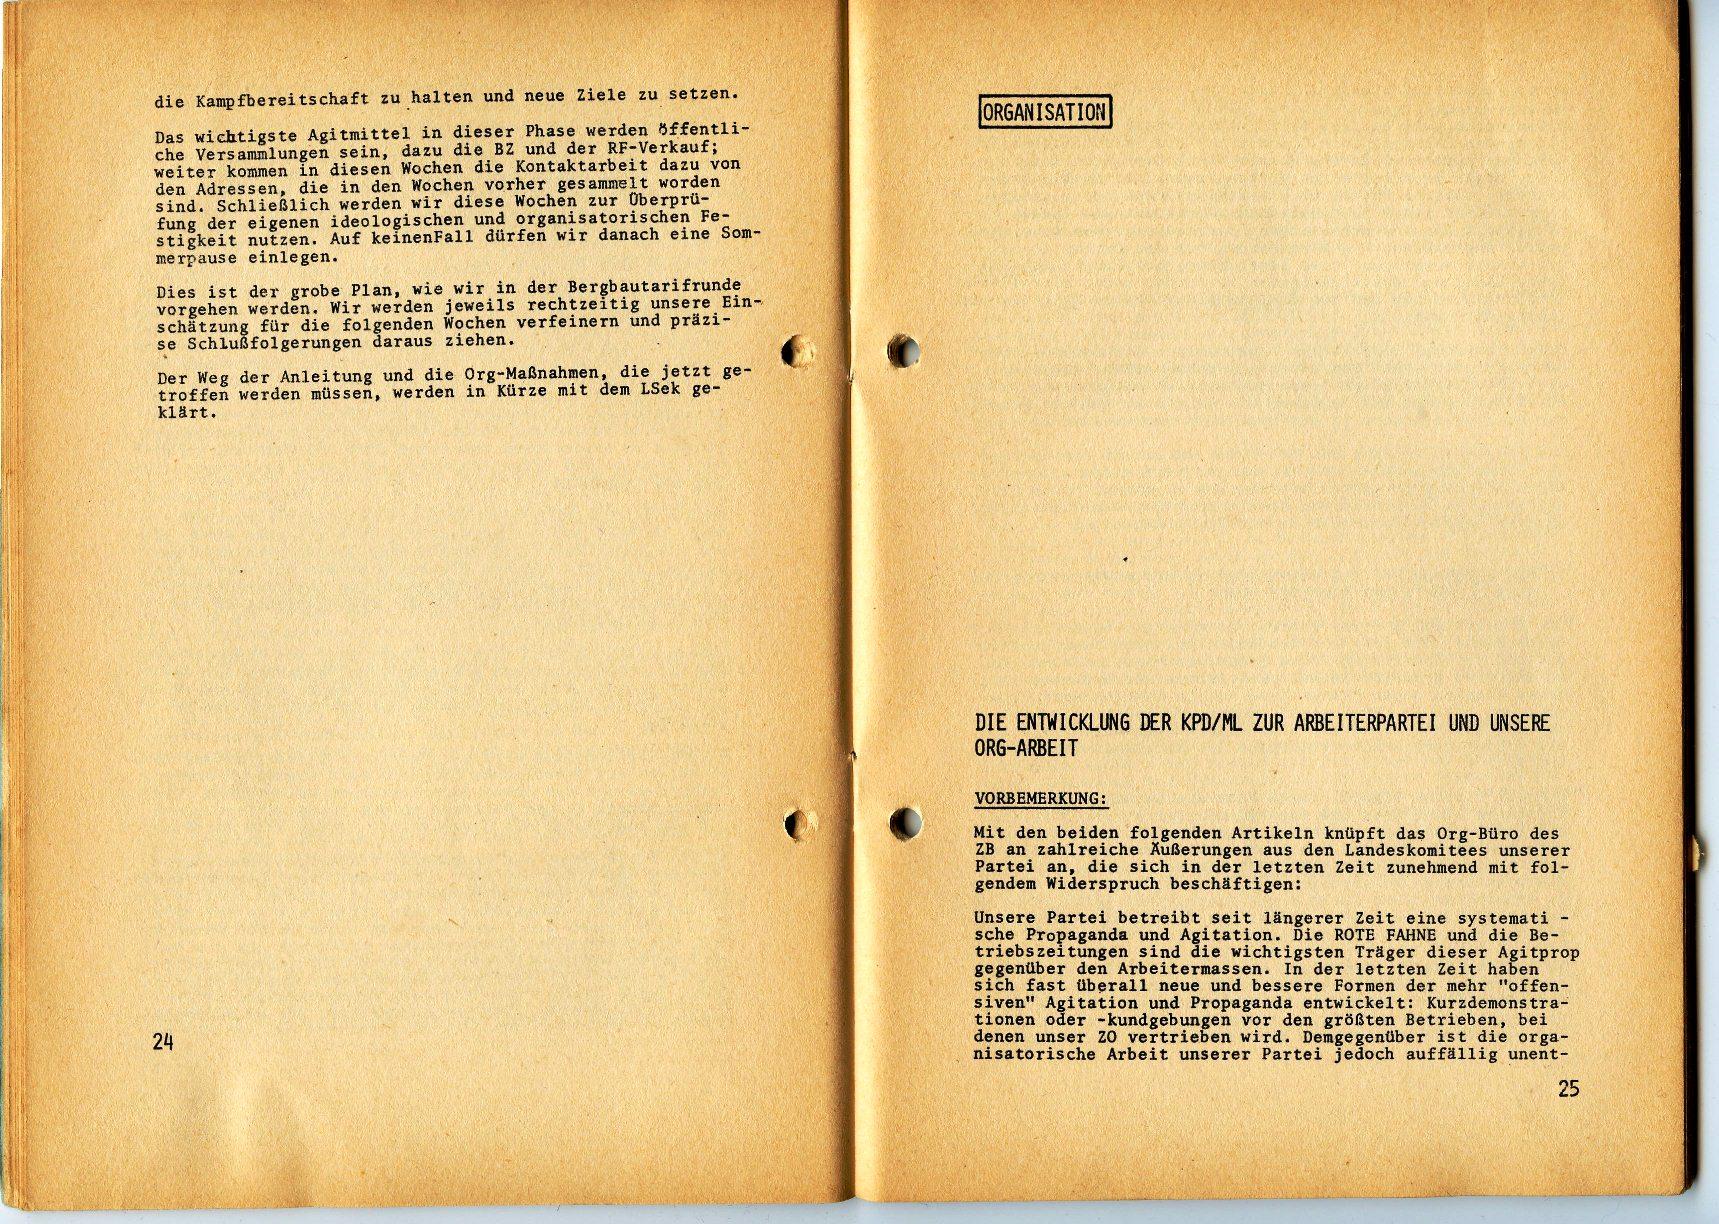 ZB_Parteiarbeiter_1971_04_13